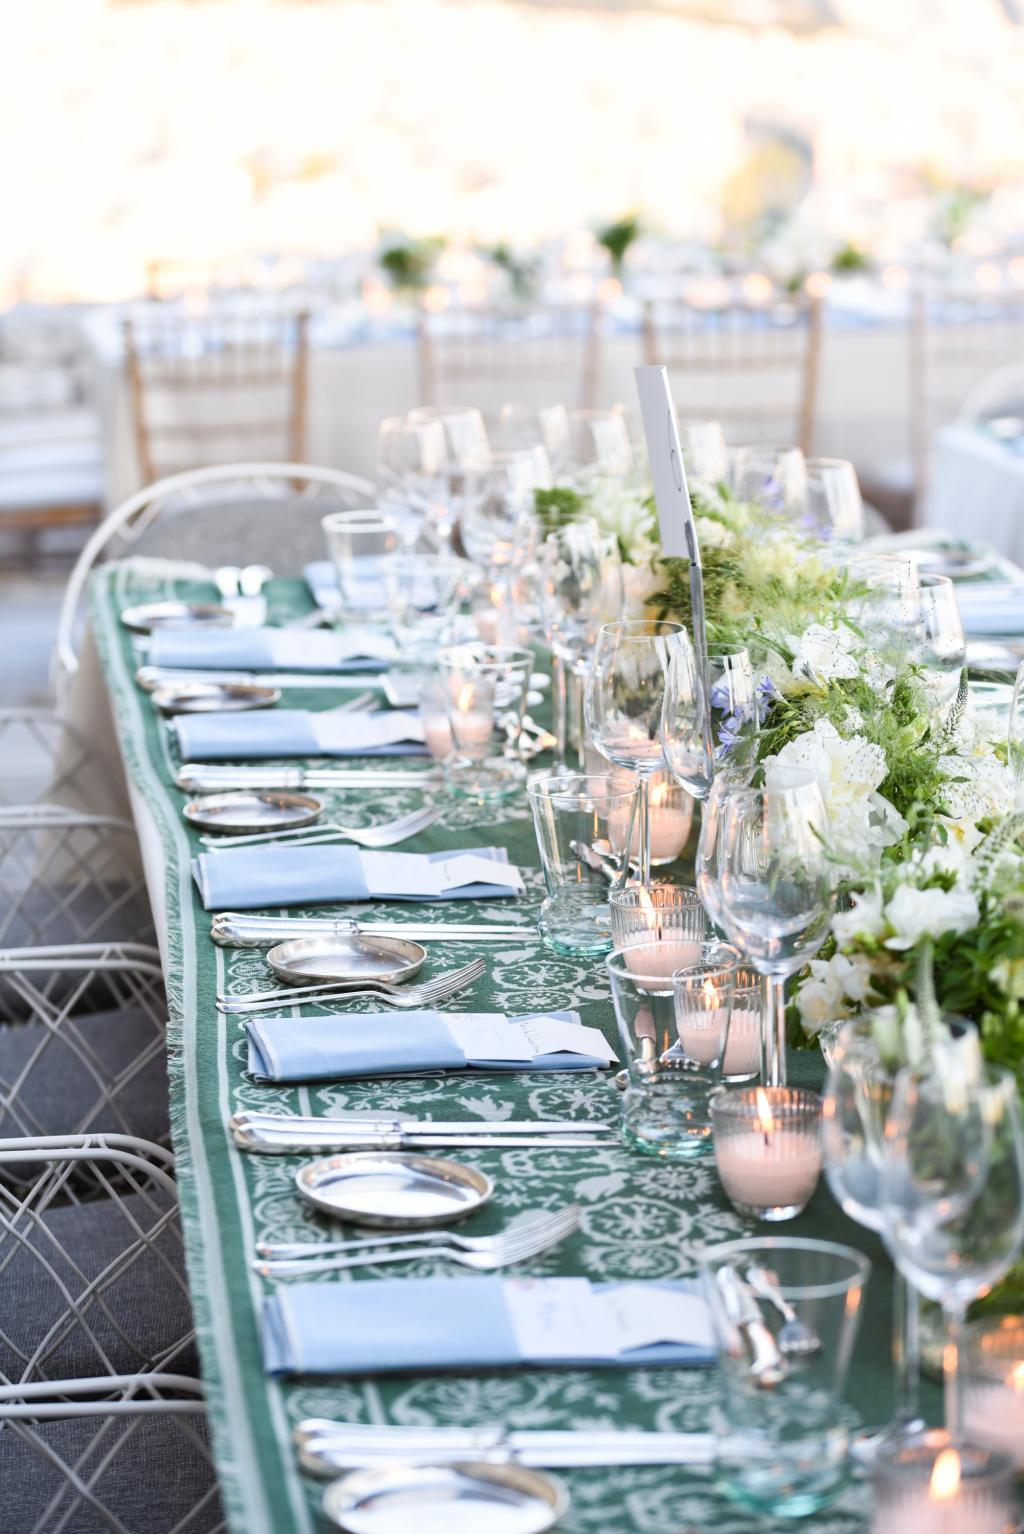 A&A Athens wedding - Image 10